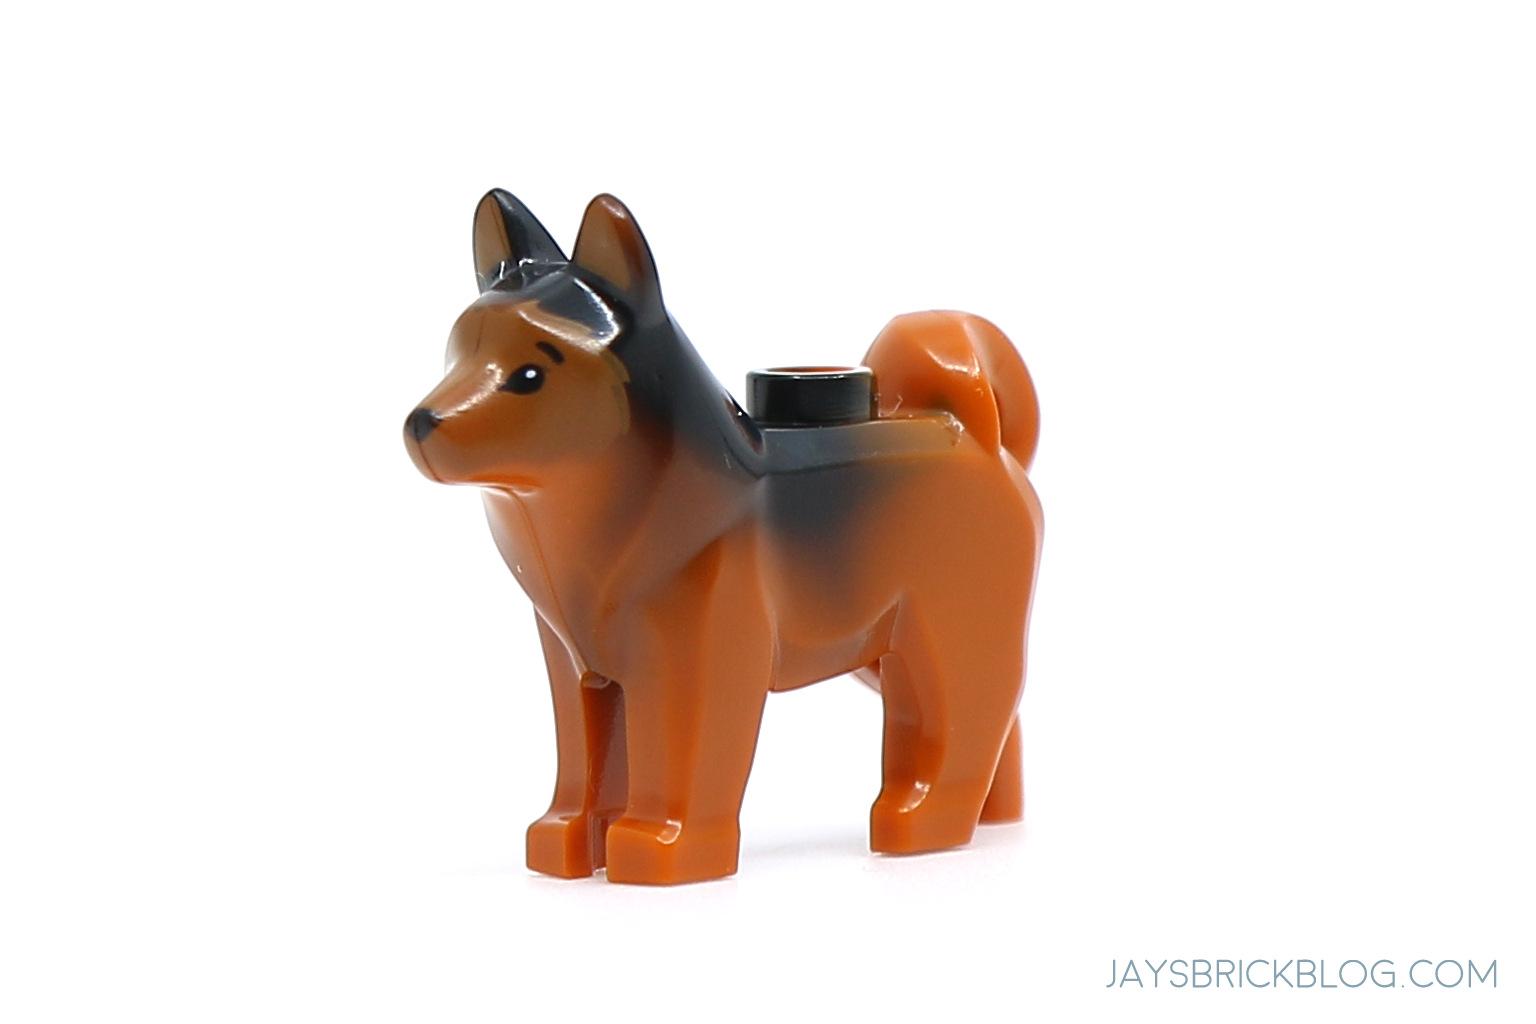 Lego Jurassic World Minifigure Animal RED the Husky Dog from set 75935 New